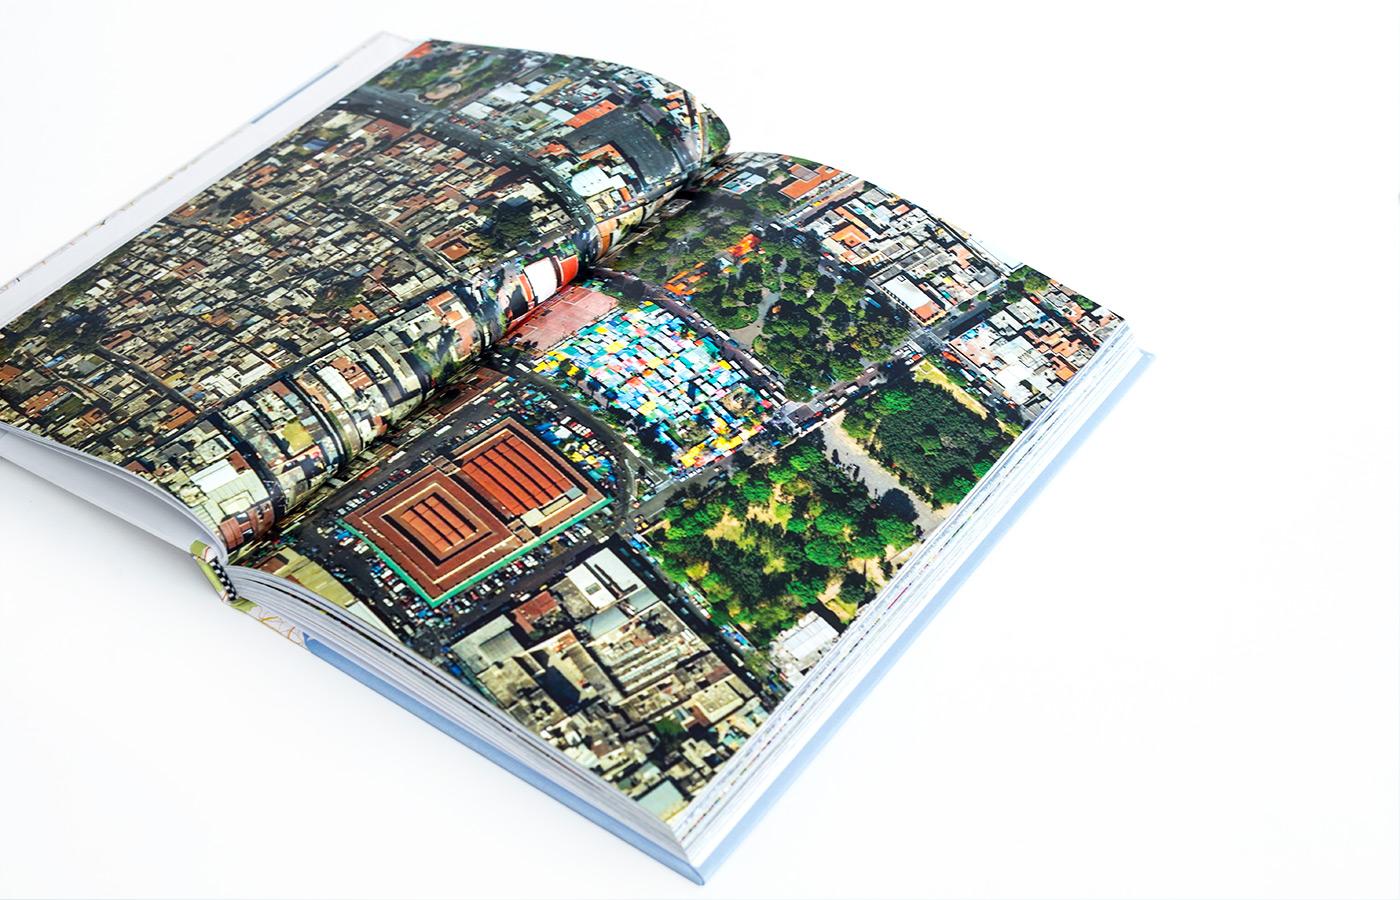 http://carlbeanlarson.com/files/gimgs/32_google-maps-atlas-05-mexico.jpg